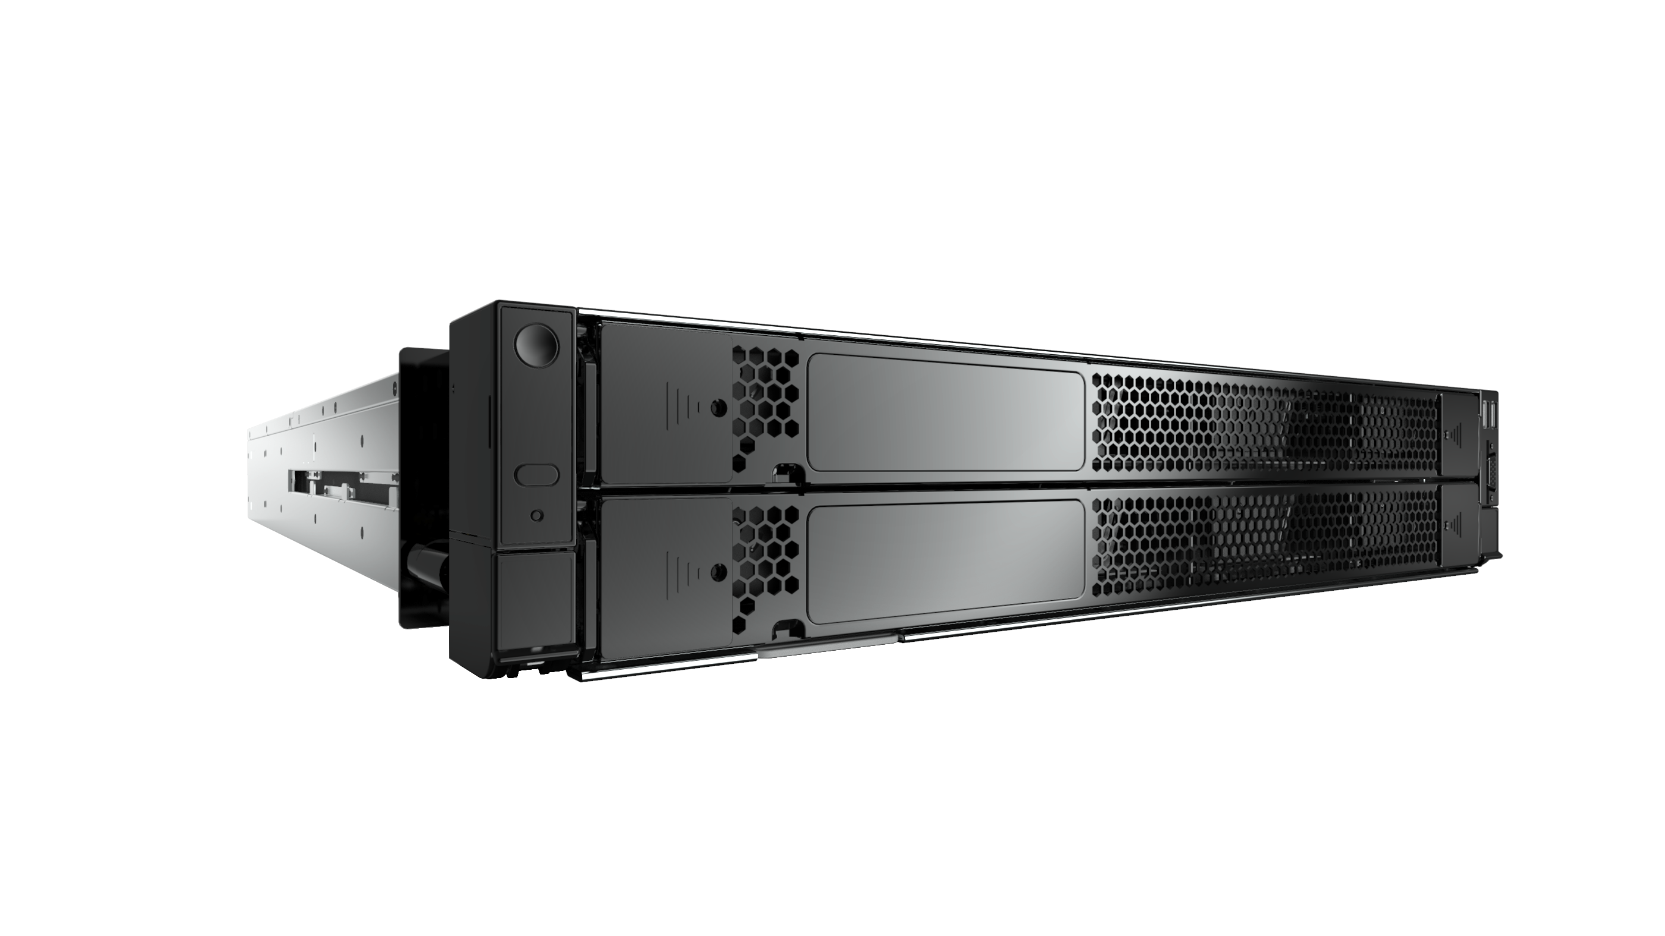 Huawei, Yeni Depolama Sunucusu, FusionServer Pro 2298 V5'i Tanıttı